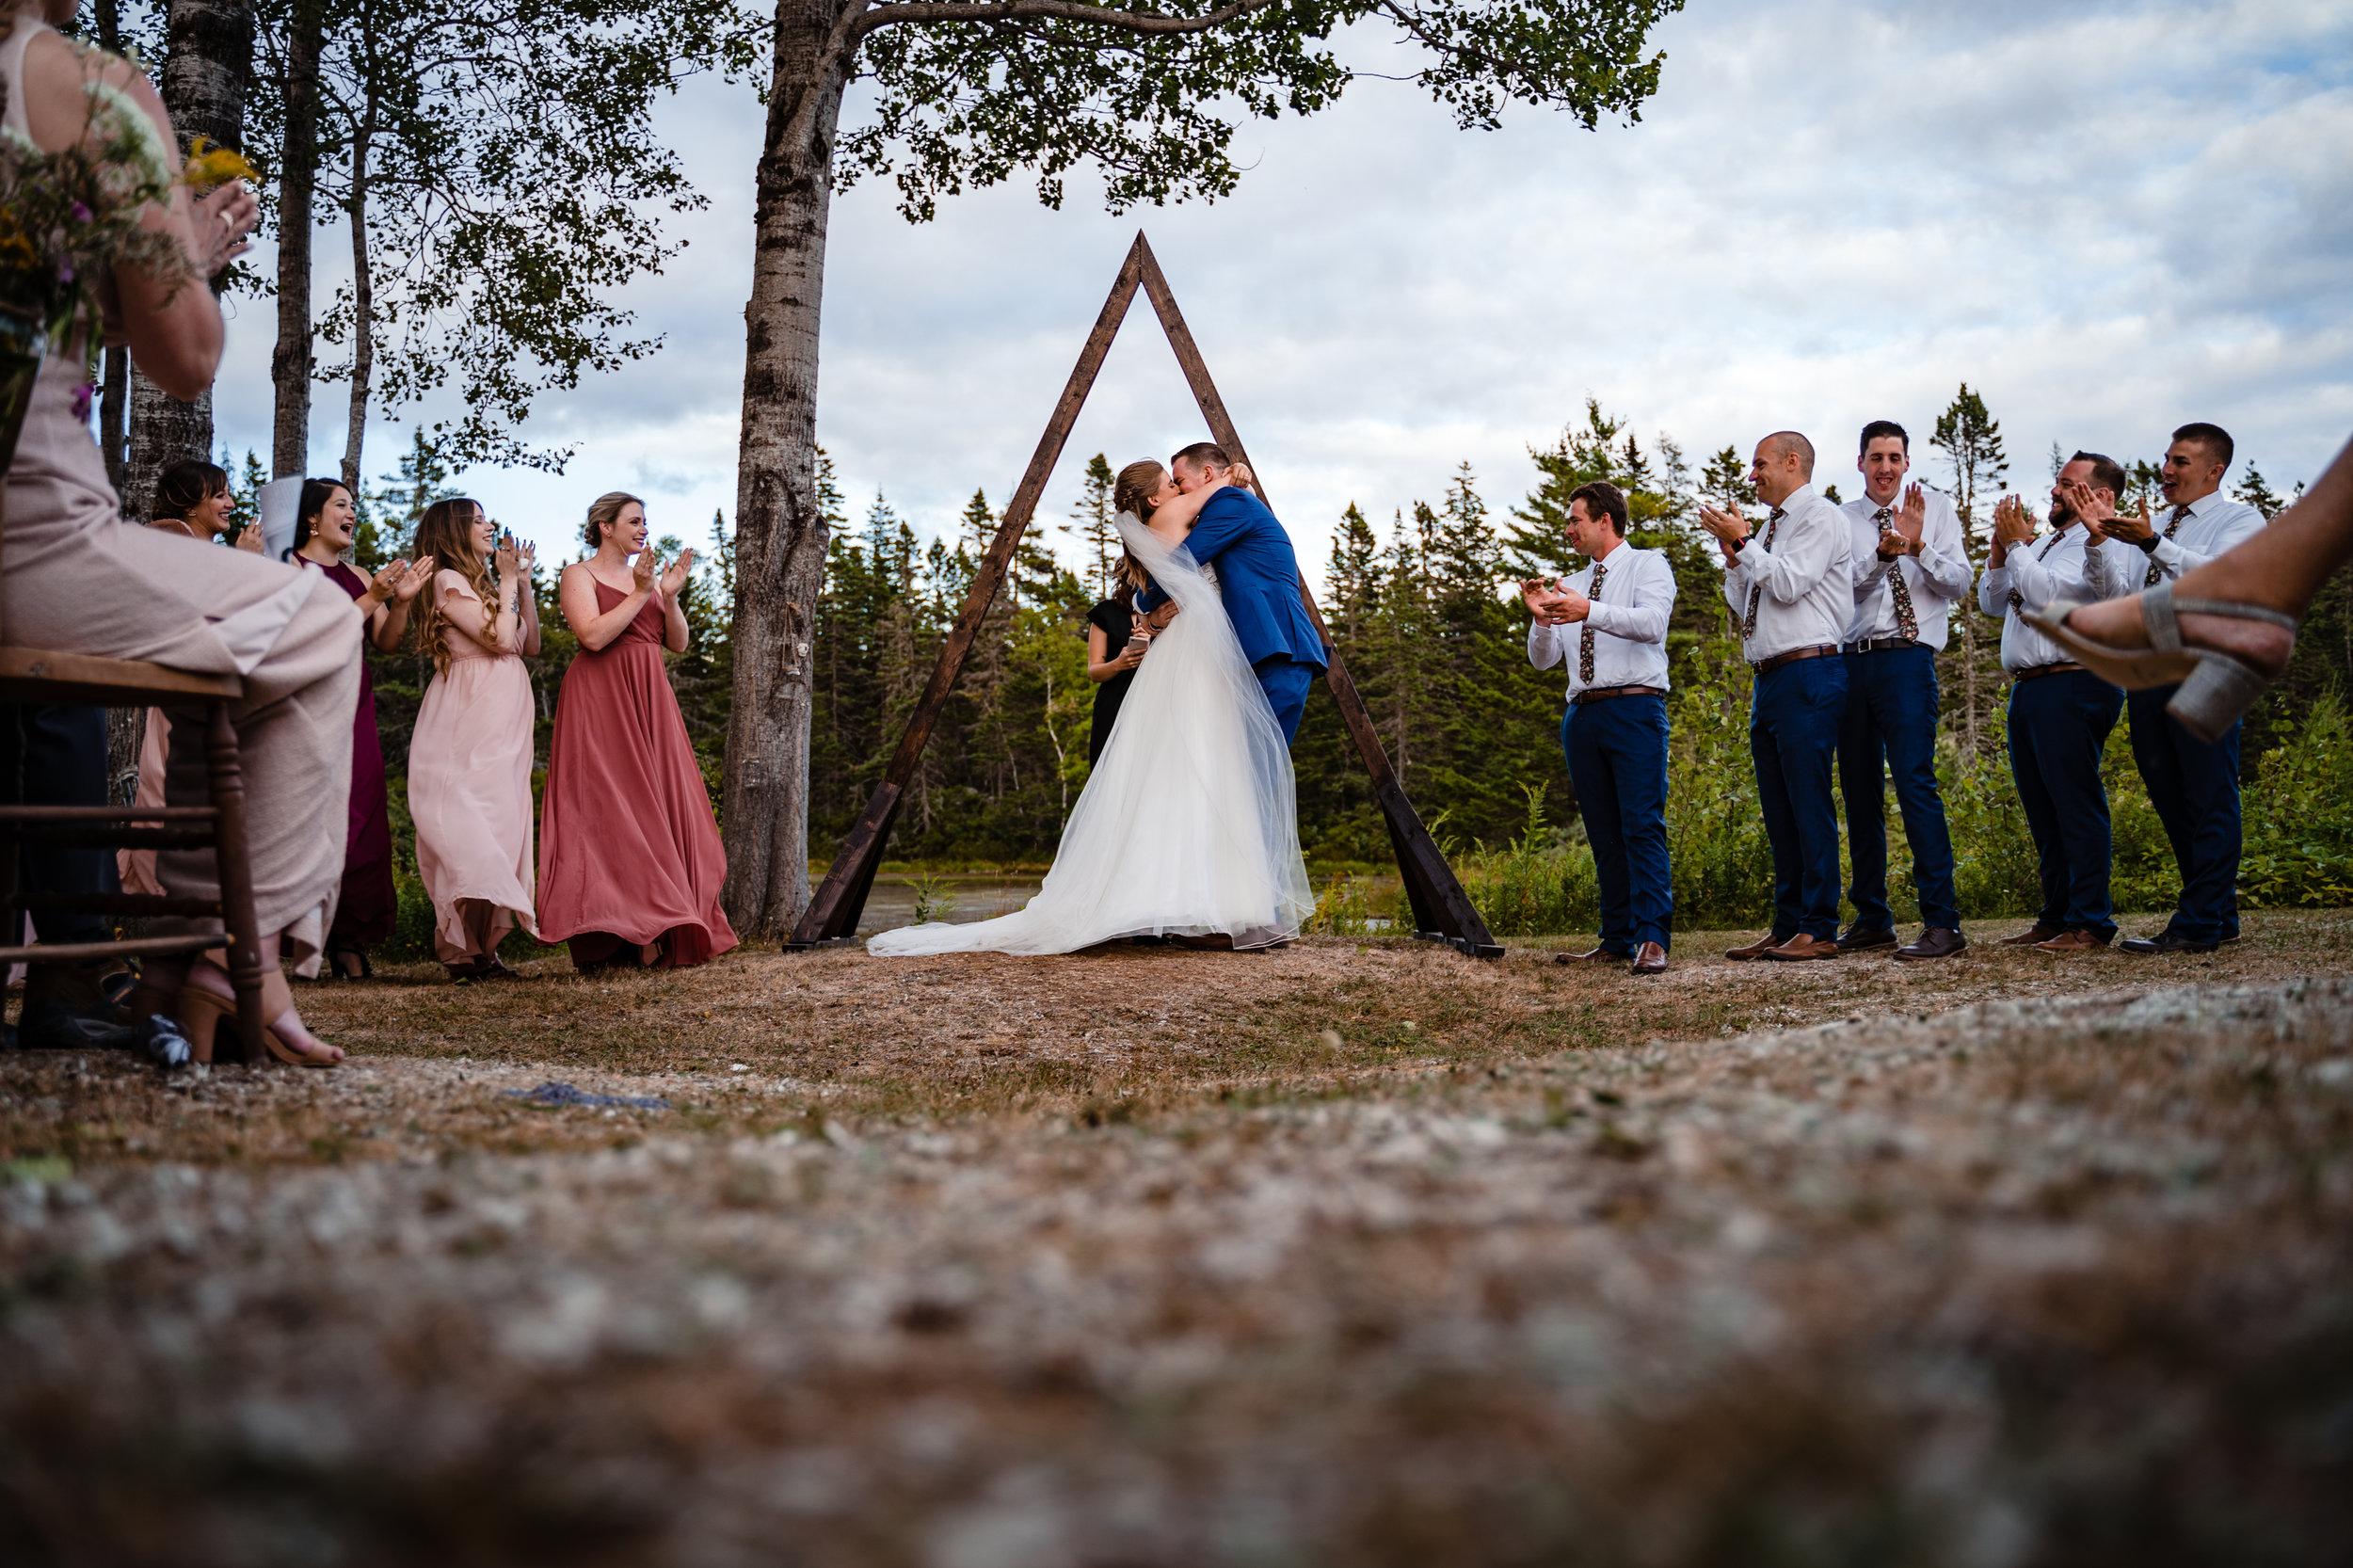 Janelle-Mitch-Halifax-Wedding-Nova-Scotia-Photography (127 of 163).jpg